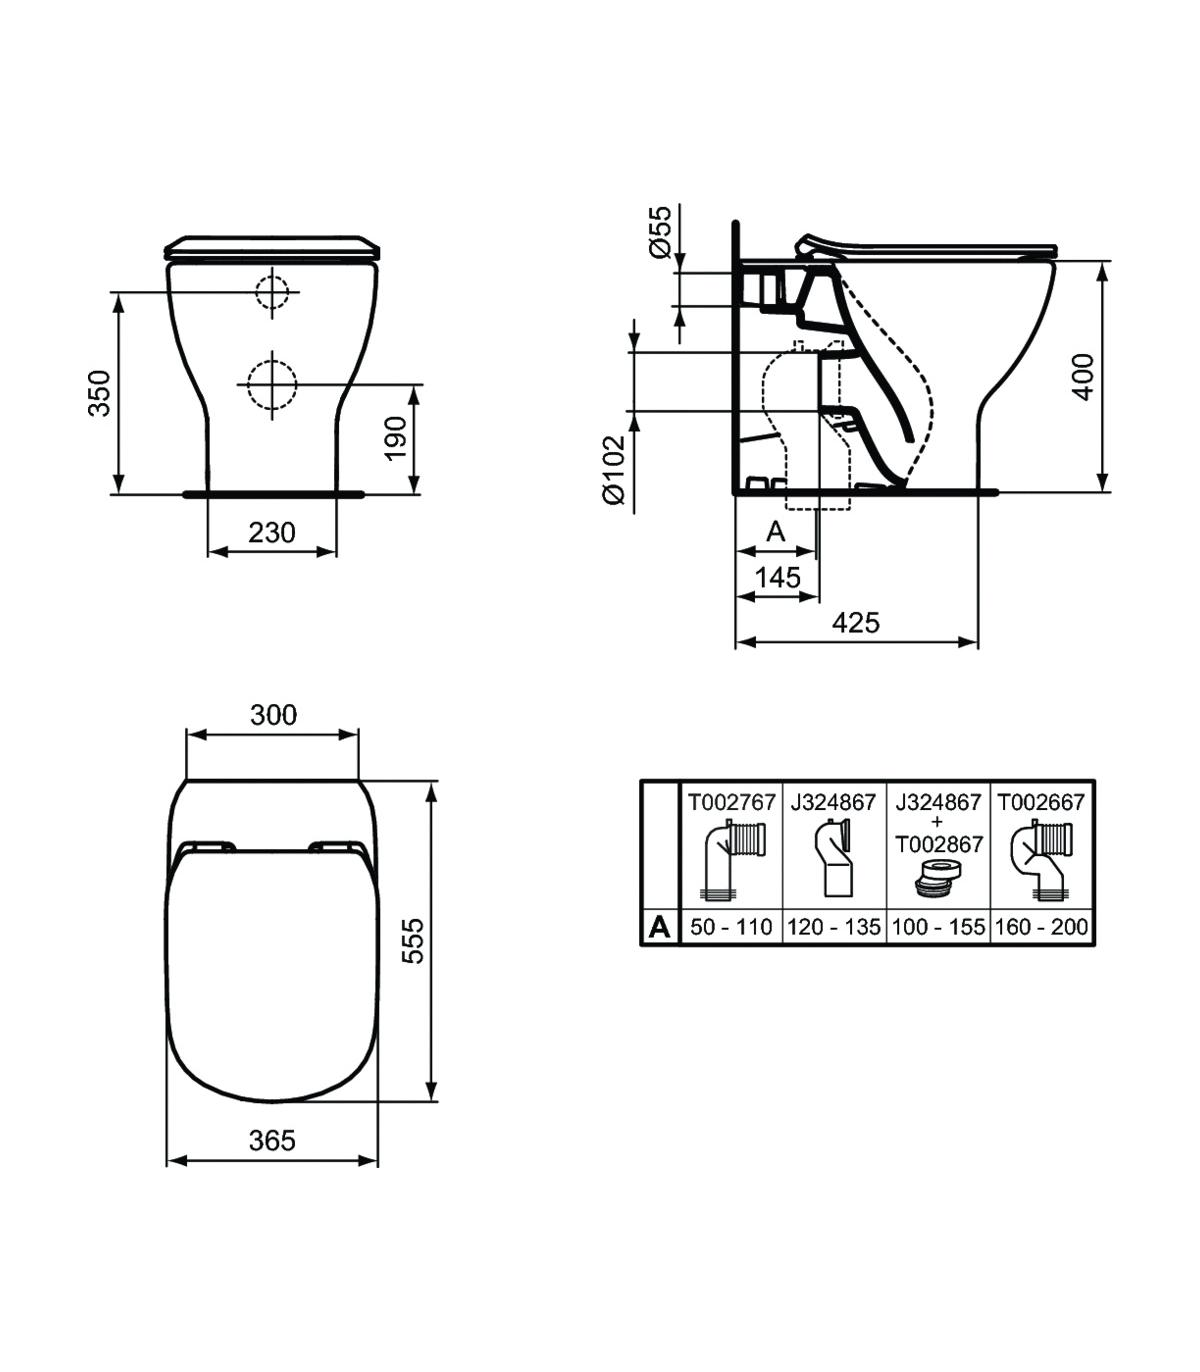 Sedile Water Ideal Standard Tesi.Floor Standing Toilet Back To Wall Ideal Standard Tesi Aquablade